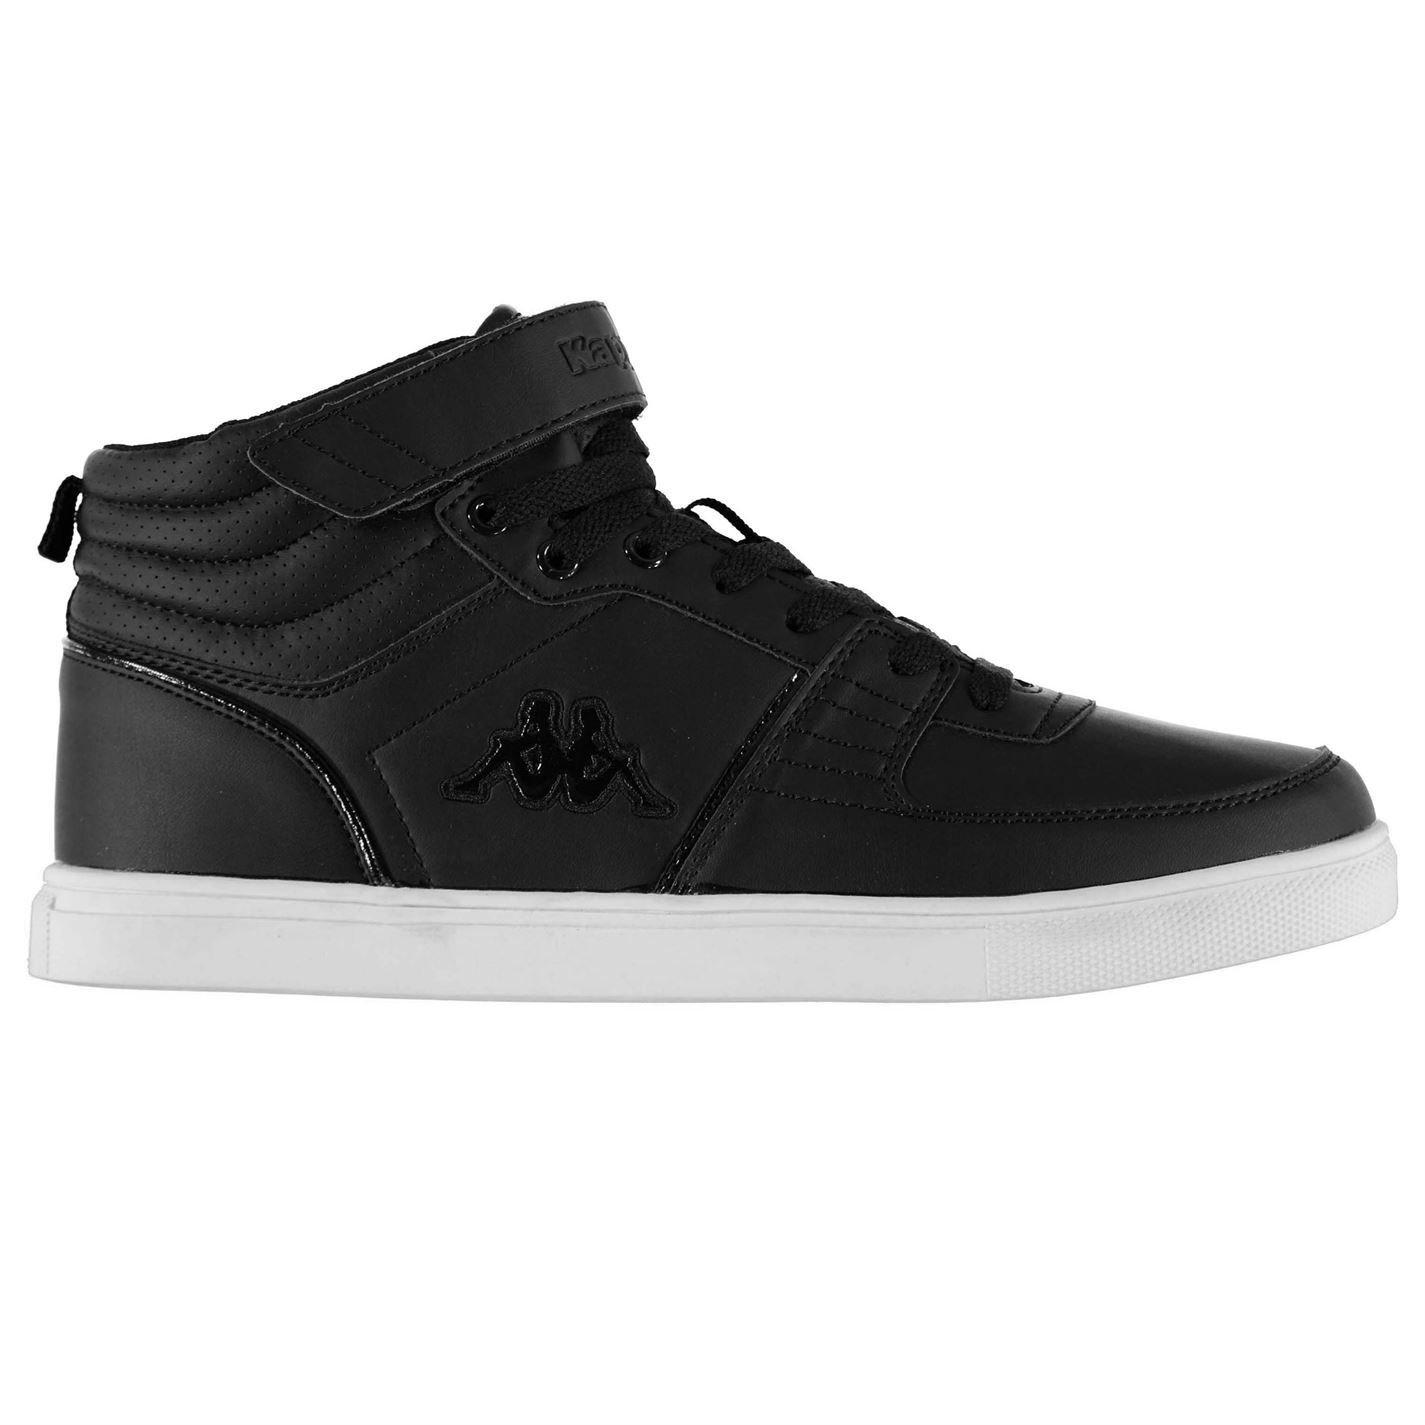 Kappa Aria Mid Top Trainers Mens Black Sports Shoes Sneakers Footwear (UK9)  (EU43) (US10): Amazon.co.uk: Sports \u0026 Outdoors